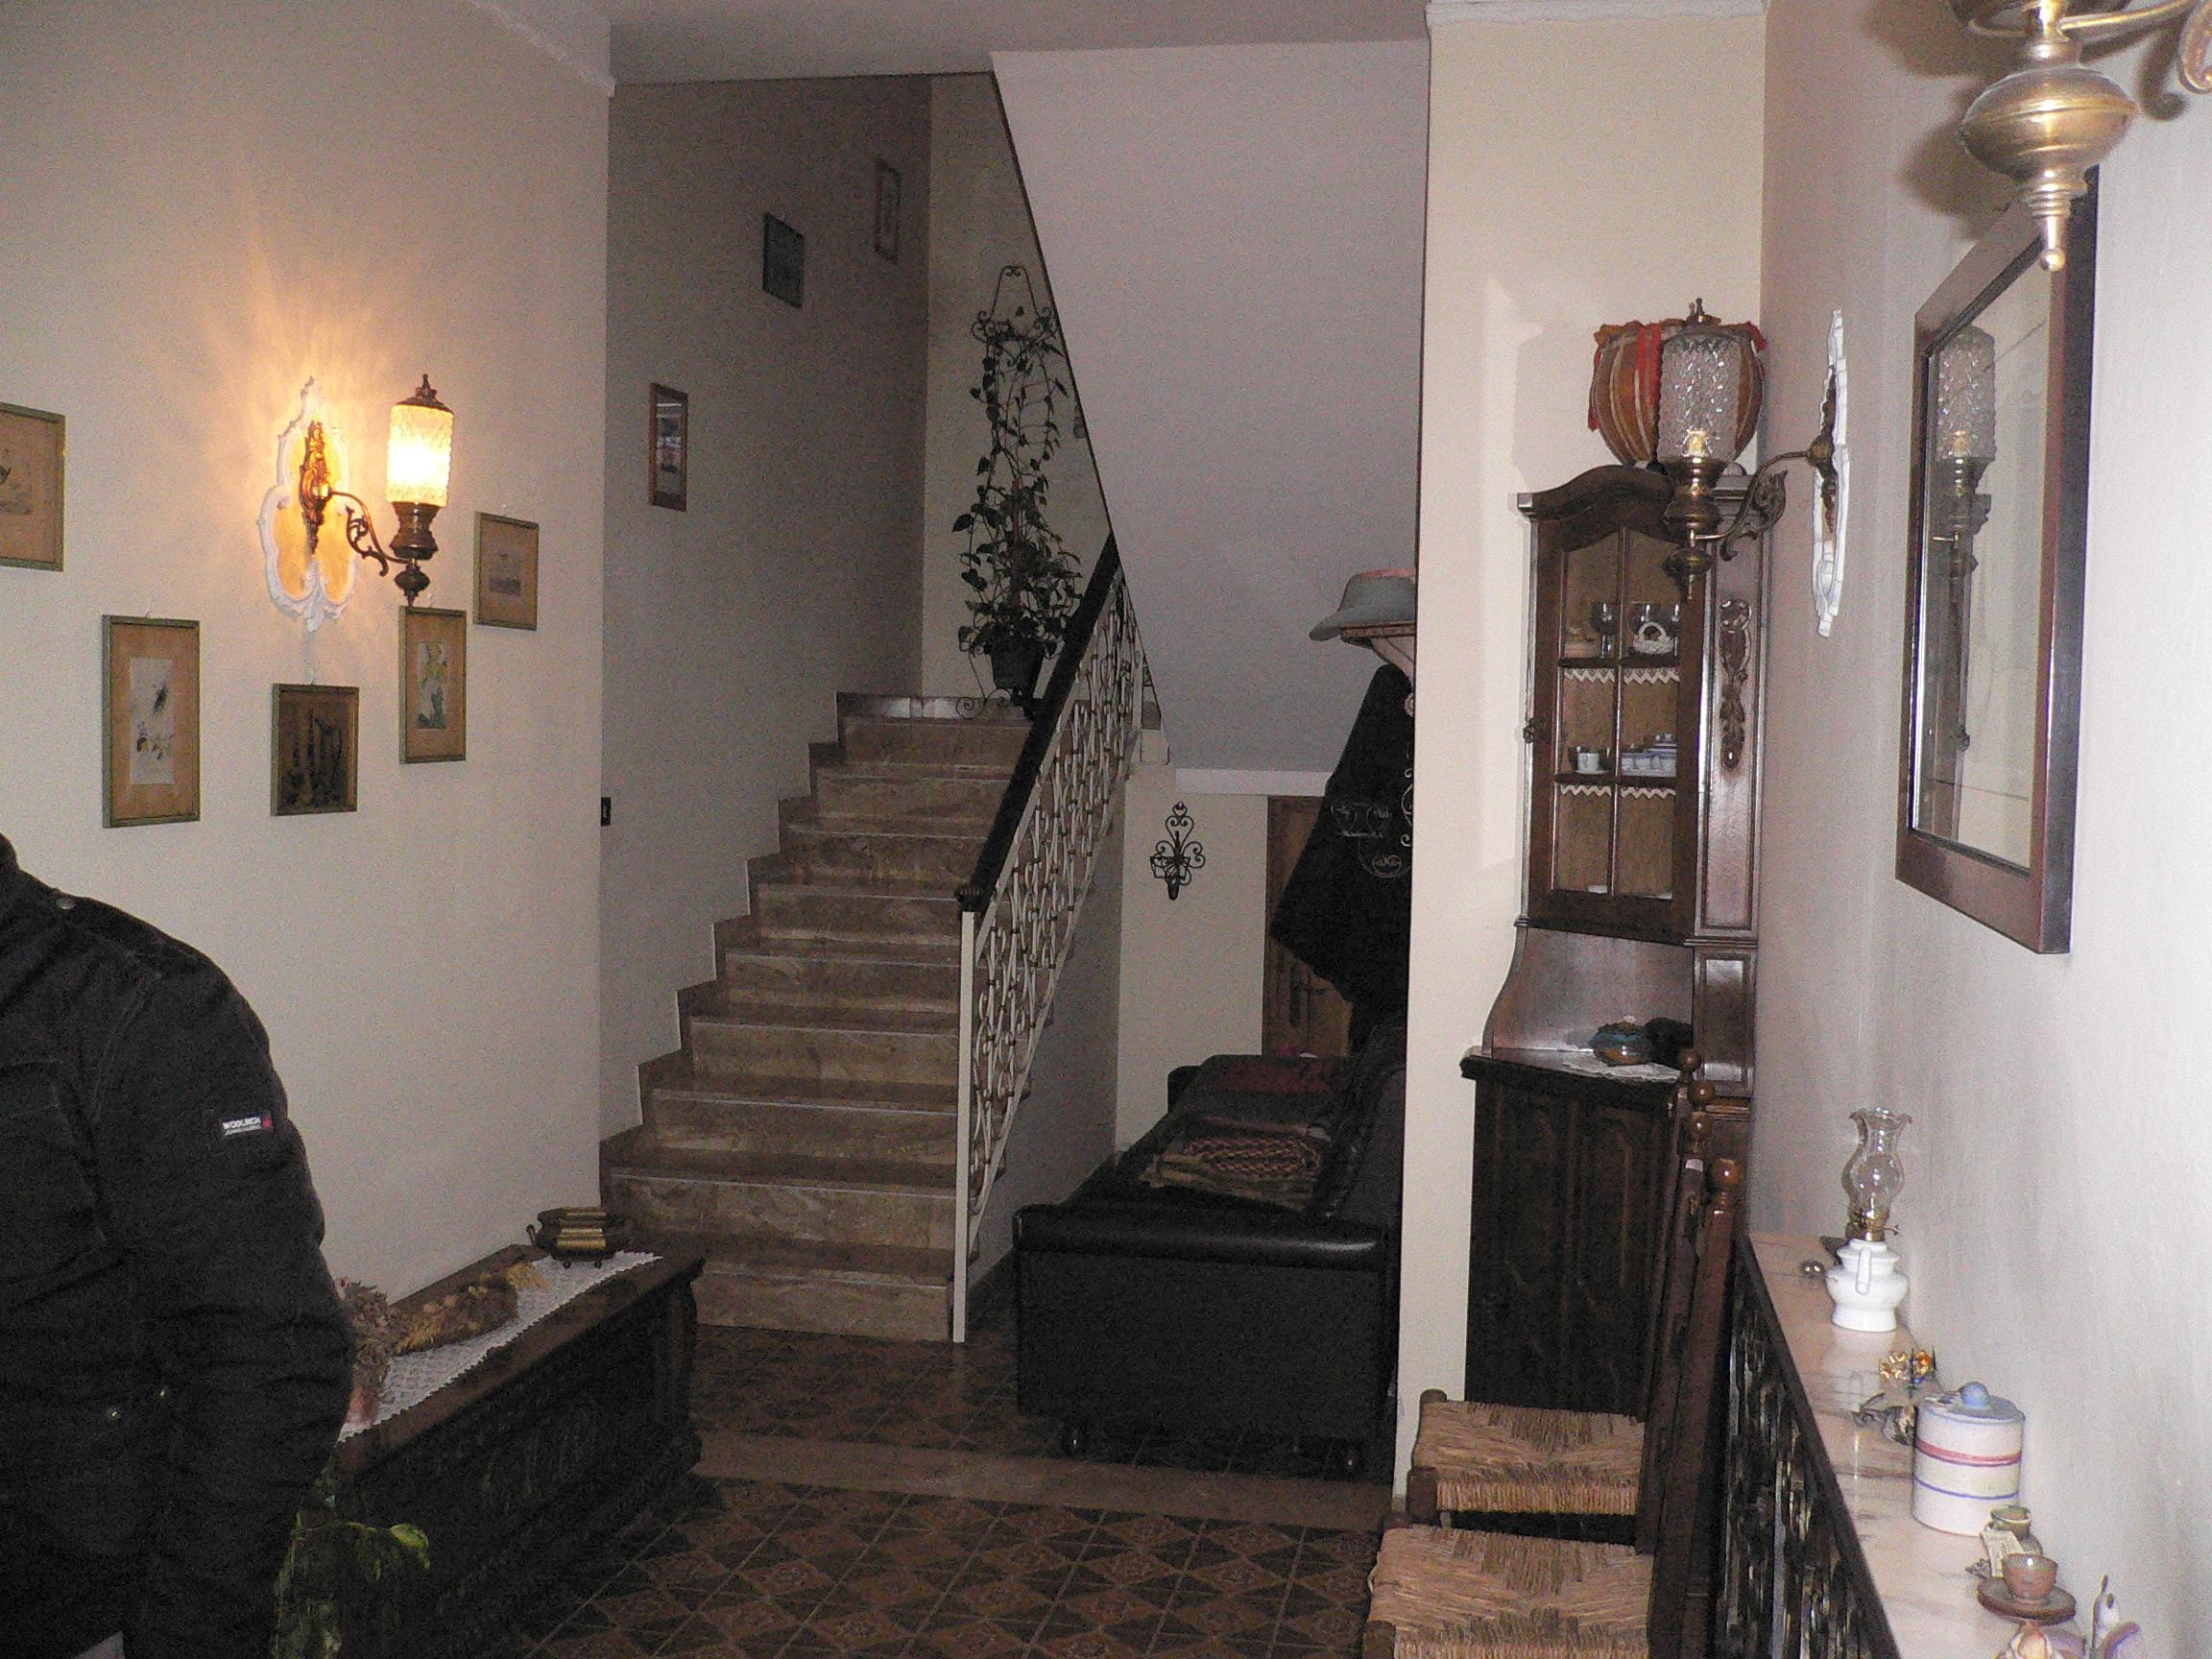 Casa indipendente in vendita a venezia agenzie for Piani di casa ranch d epoca